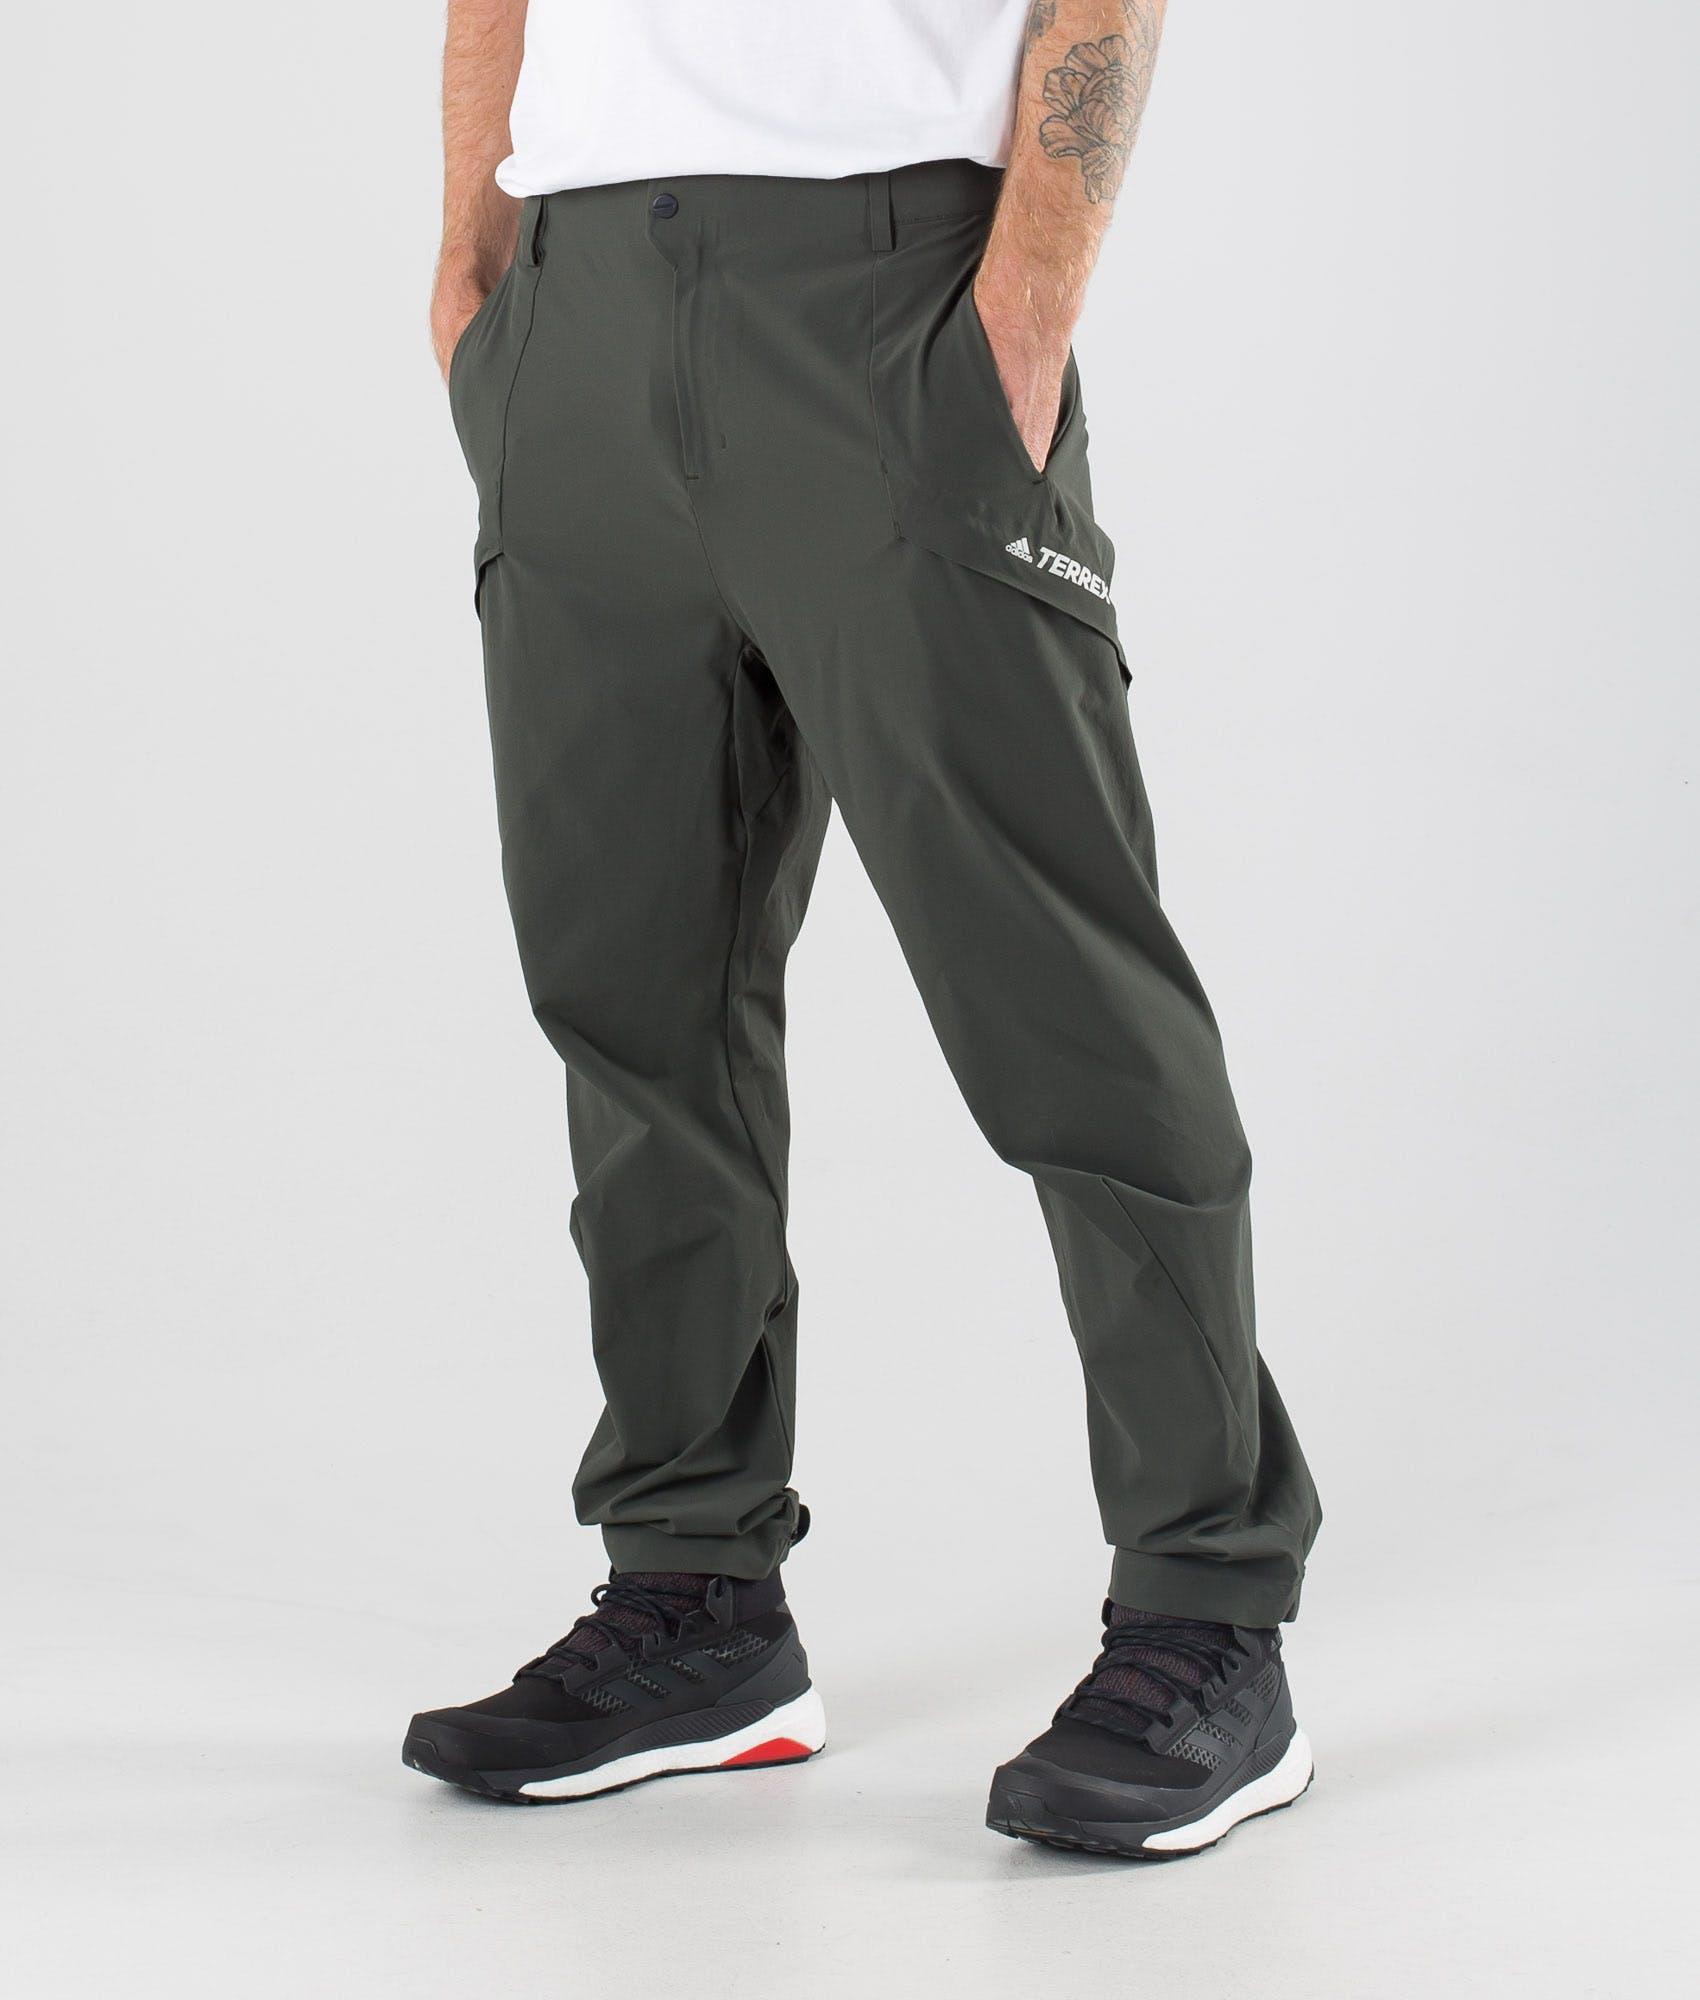 Adidas Terrex Hike